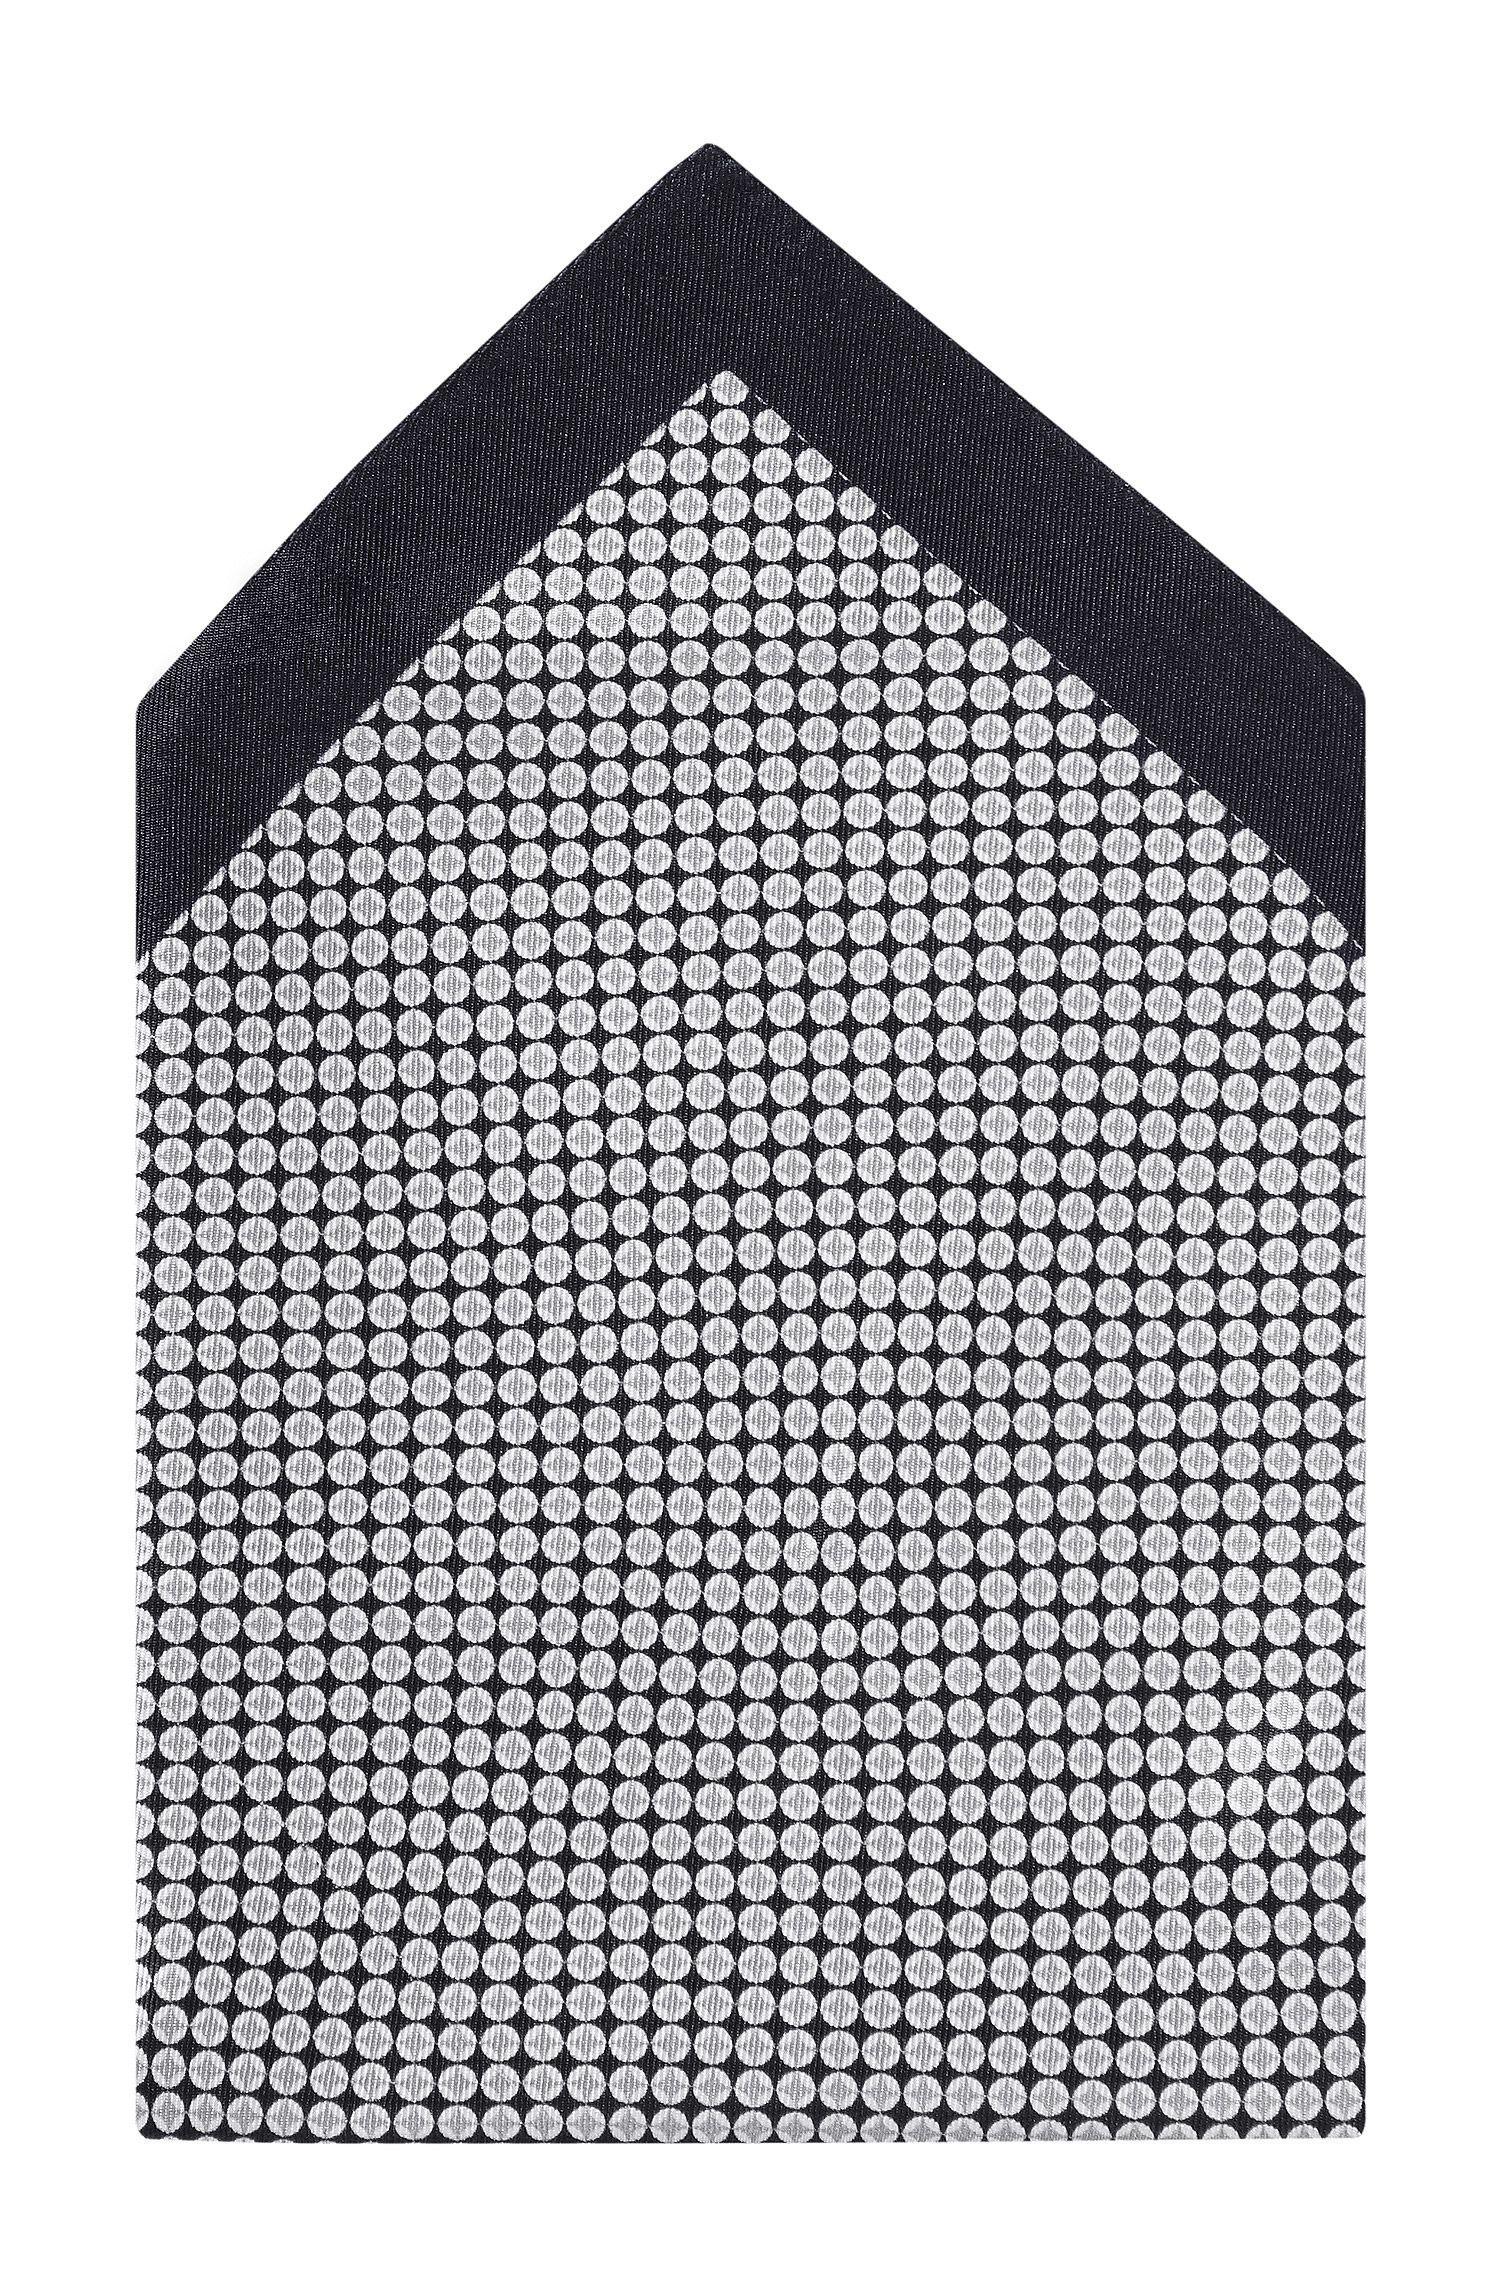 Pochet 'Pocket square 33 x 33' van zijde